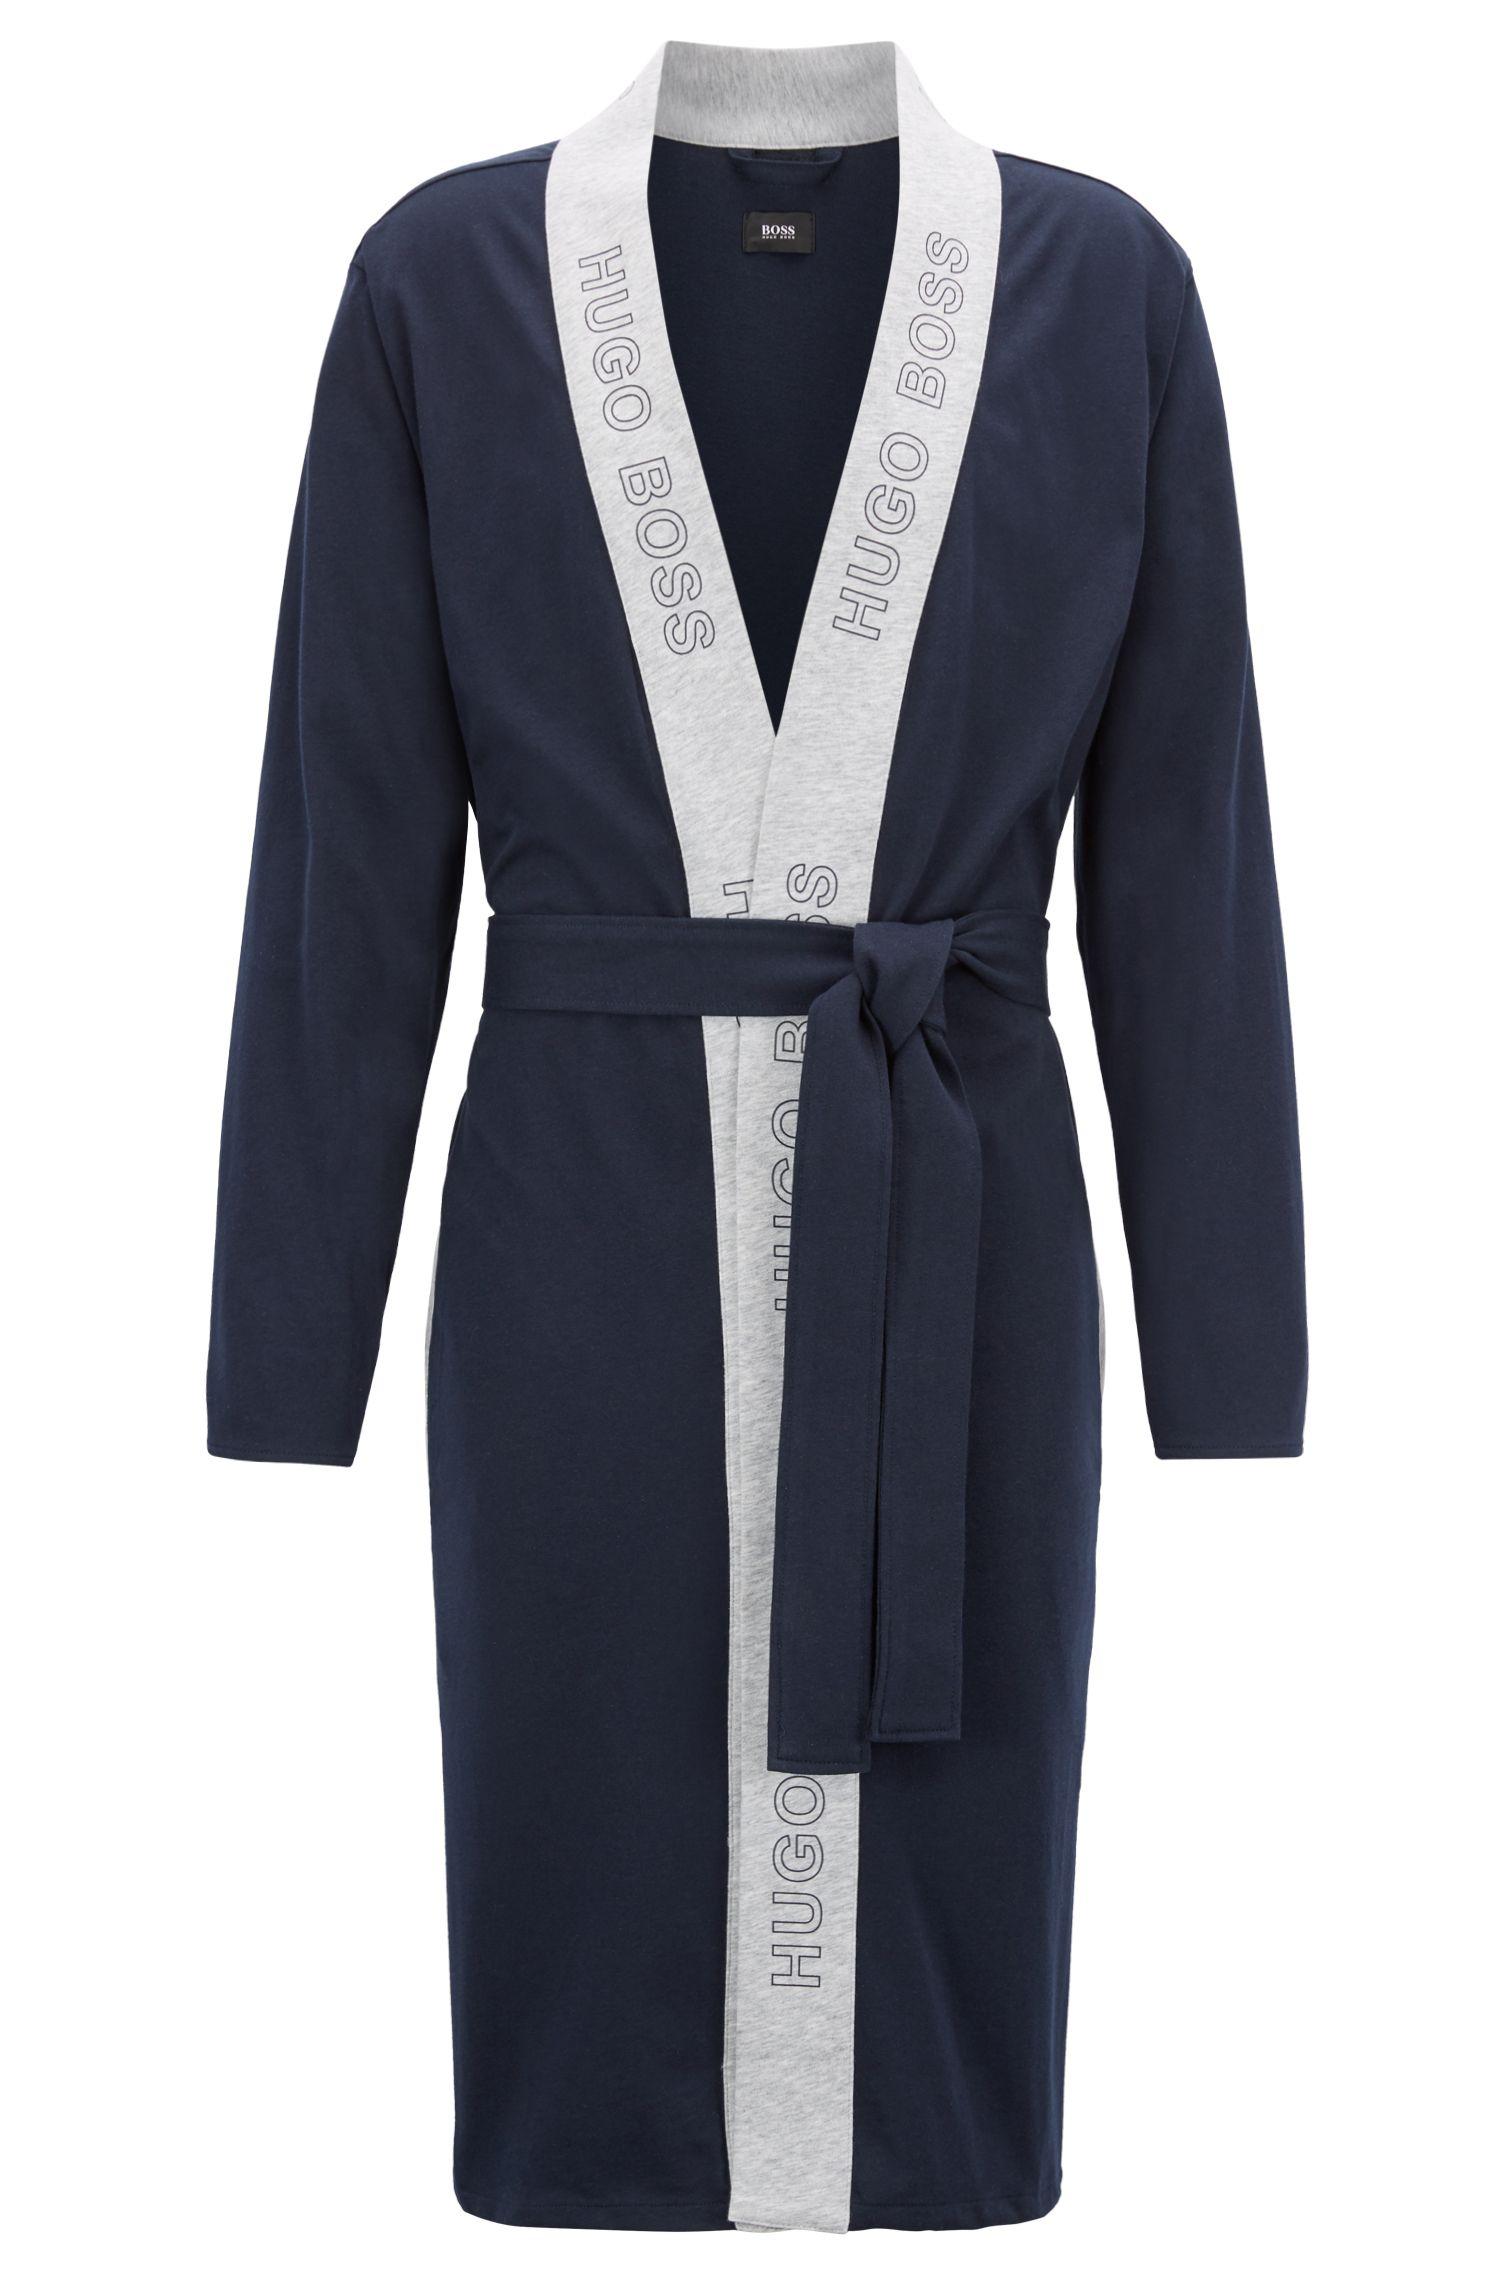 Peignoir en jersey simple de coton brossé